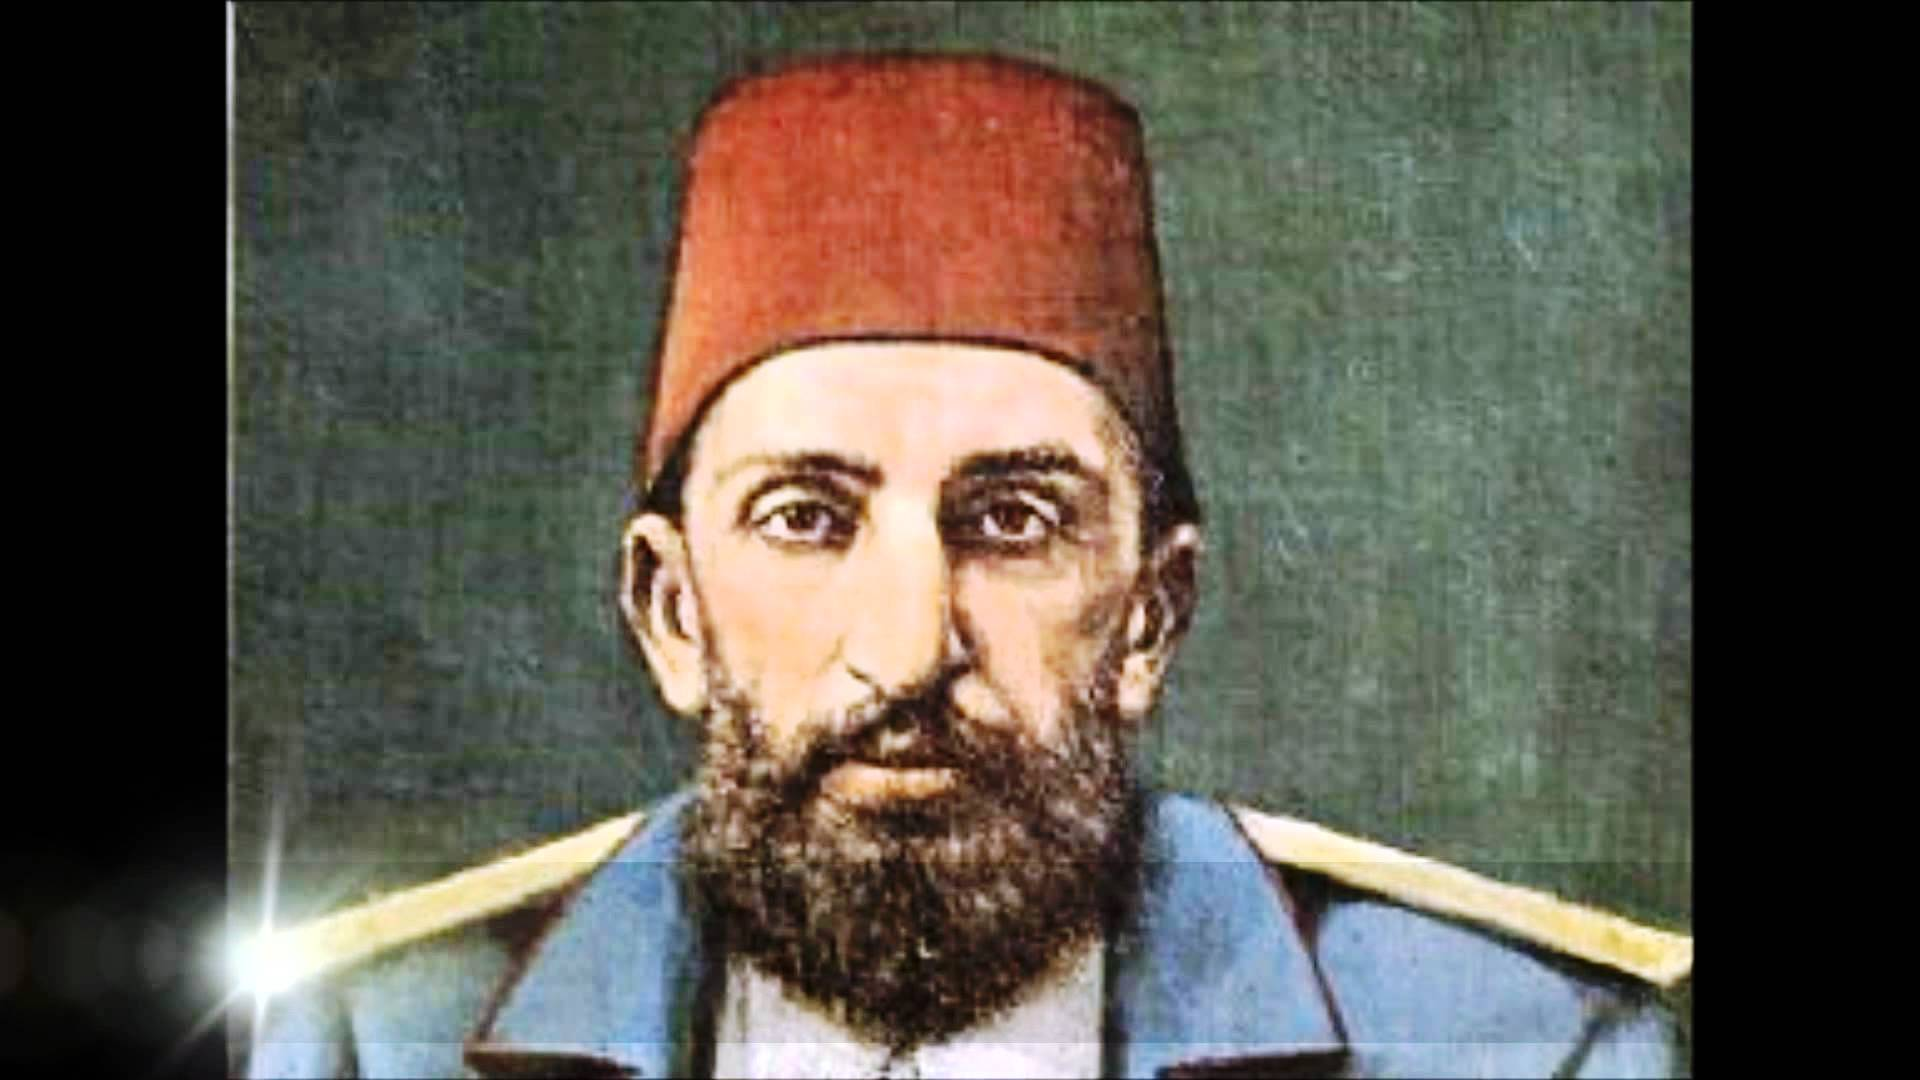 Padişah 2.Abdulhamid han Osmanlı Sultanı İkinci. Abdulhamit İslam Birligi Halifesi